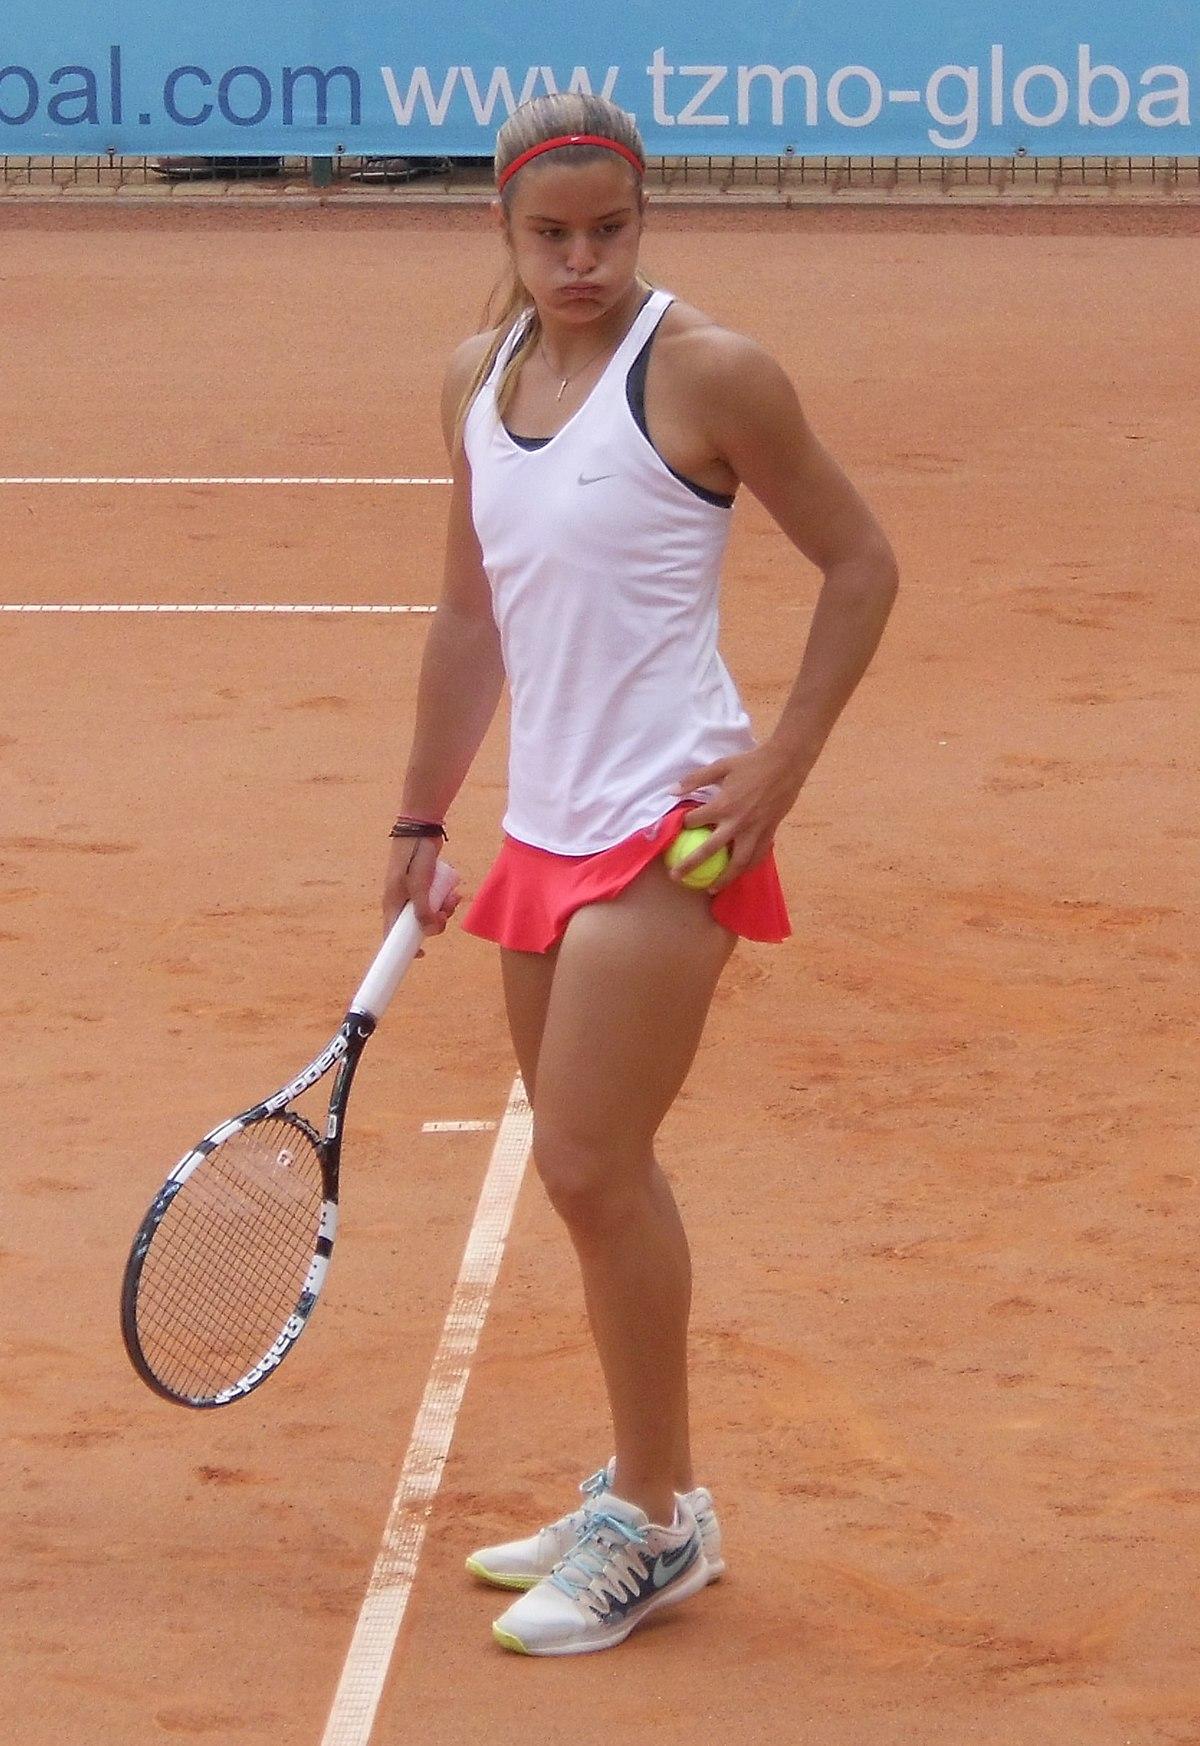 Sakkari Altezza : How Tall Is Maria Sakkari Maria Sakkari Physical  Characteristics / Professional tennis player @adidas athlete #heretocreate.  - Furniture table